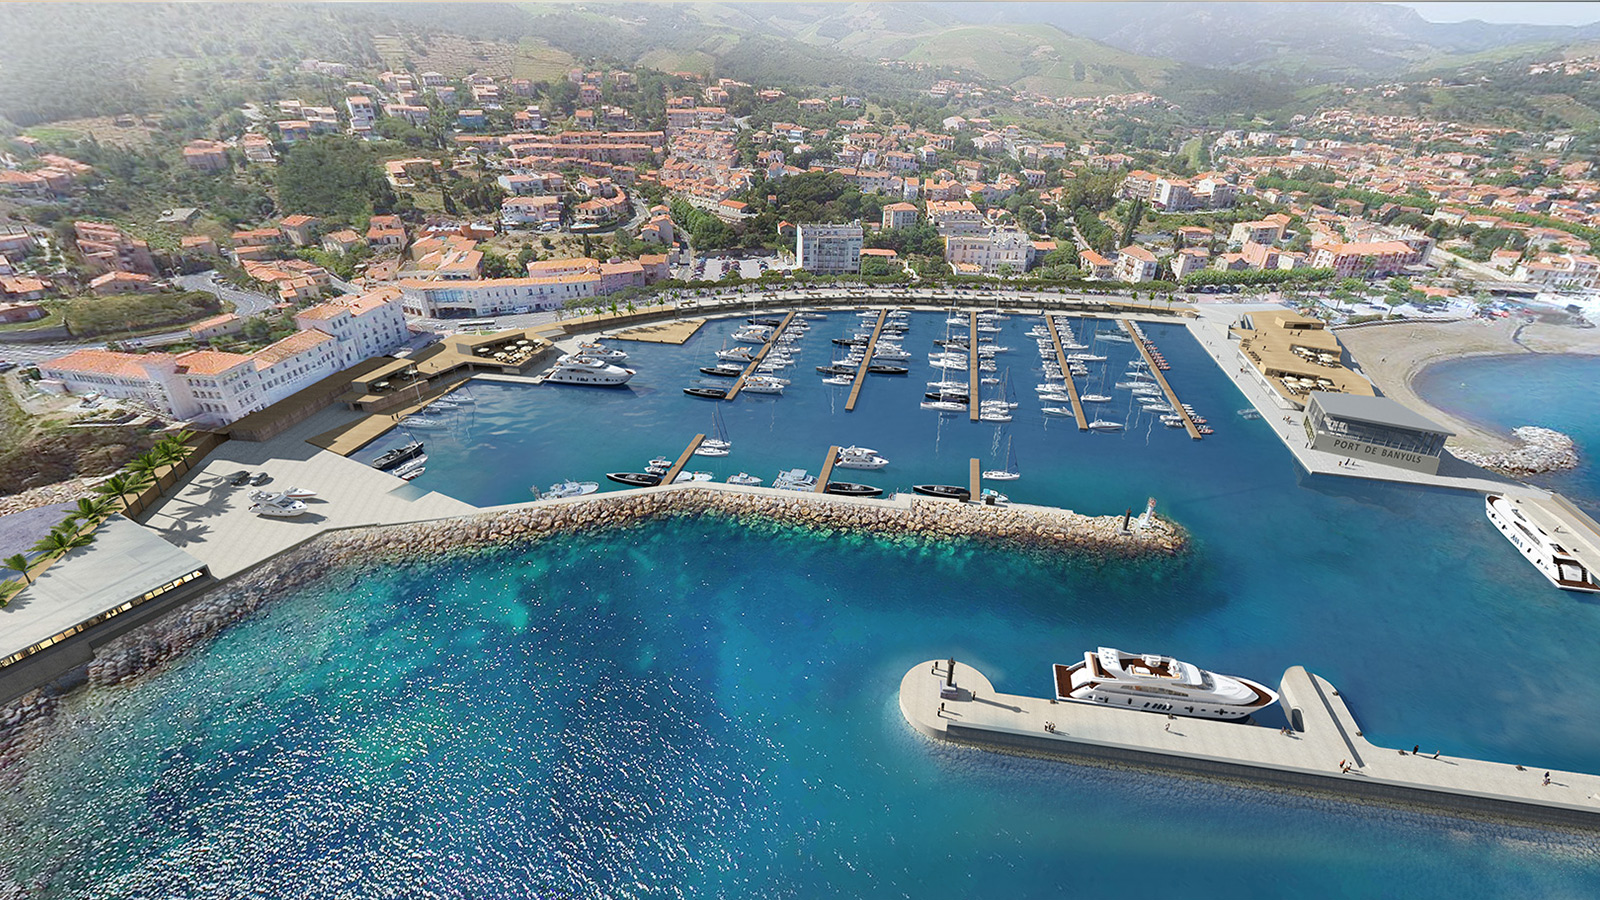 matteo-gennari-architecte-port-banyuls-2